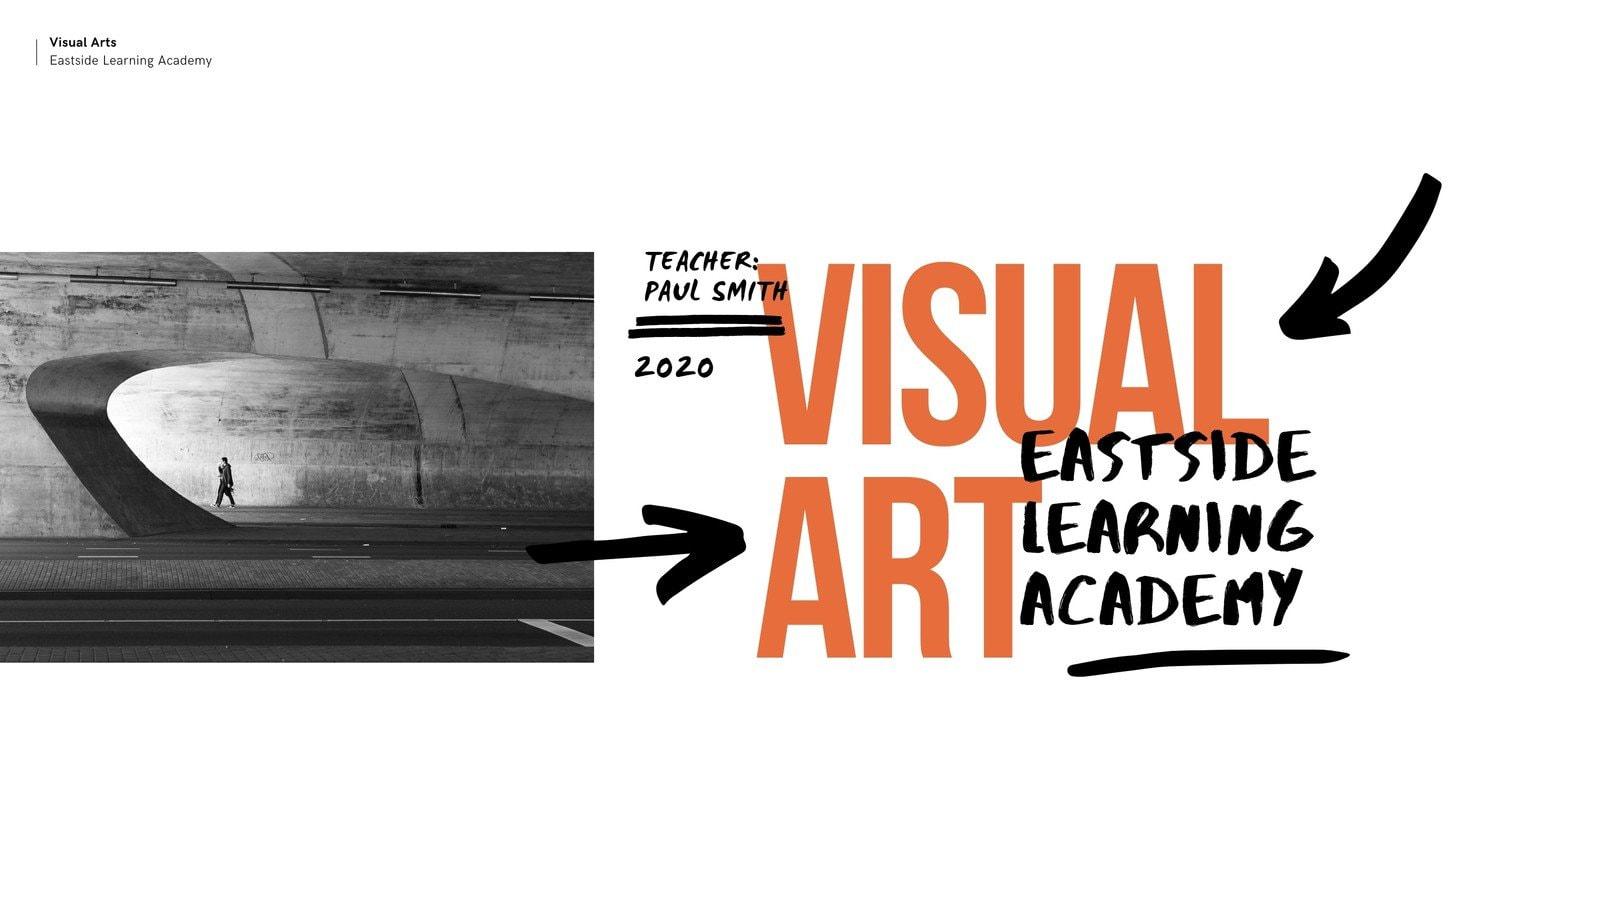 Orange and Black Abstract Visual Arts Class Education Video Presentation